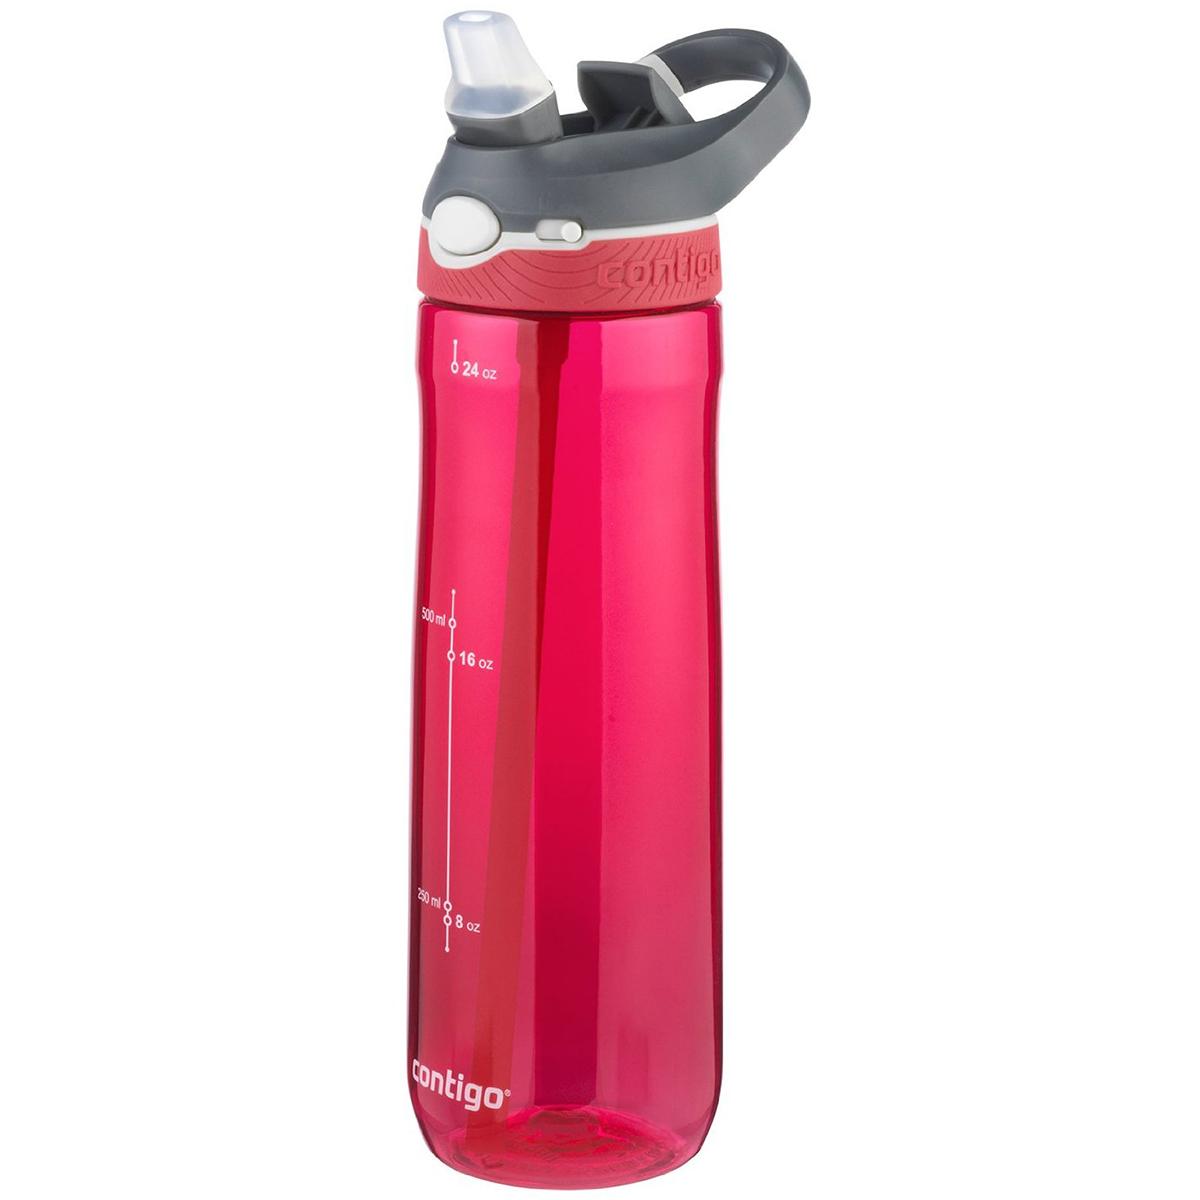 Contigo-24-oz-Ashland-Autospout-Water-Bottle miniatuur 28